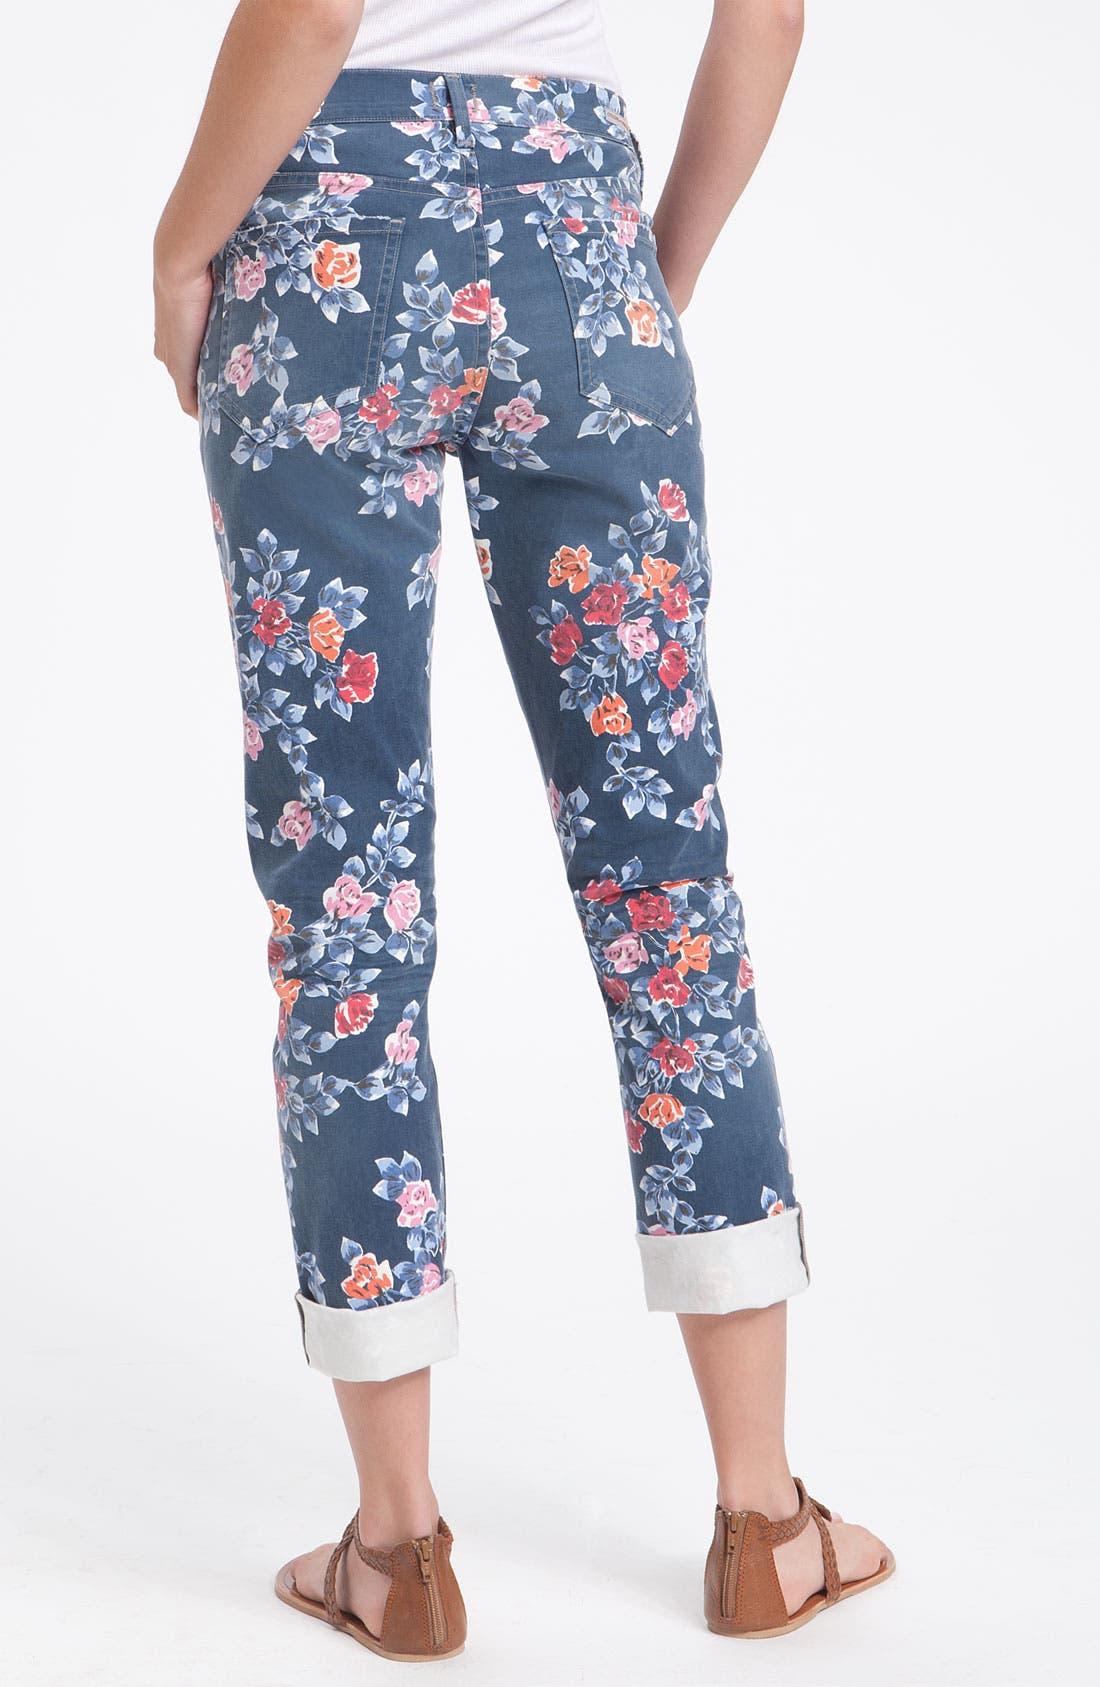 Main Image - Citizens of Humanity 'Mandy' High Waist Slim Leg Floral Print Jeans (Navy Petite Rose)